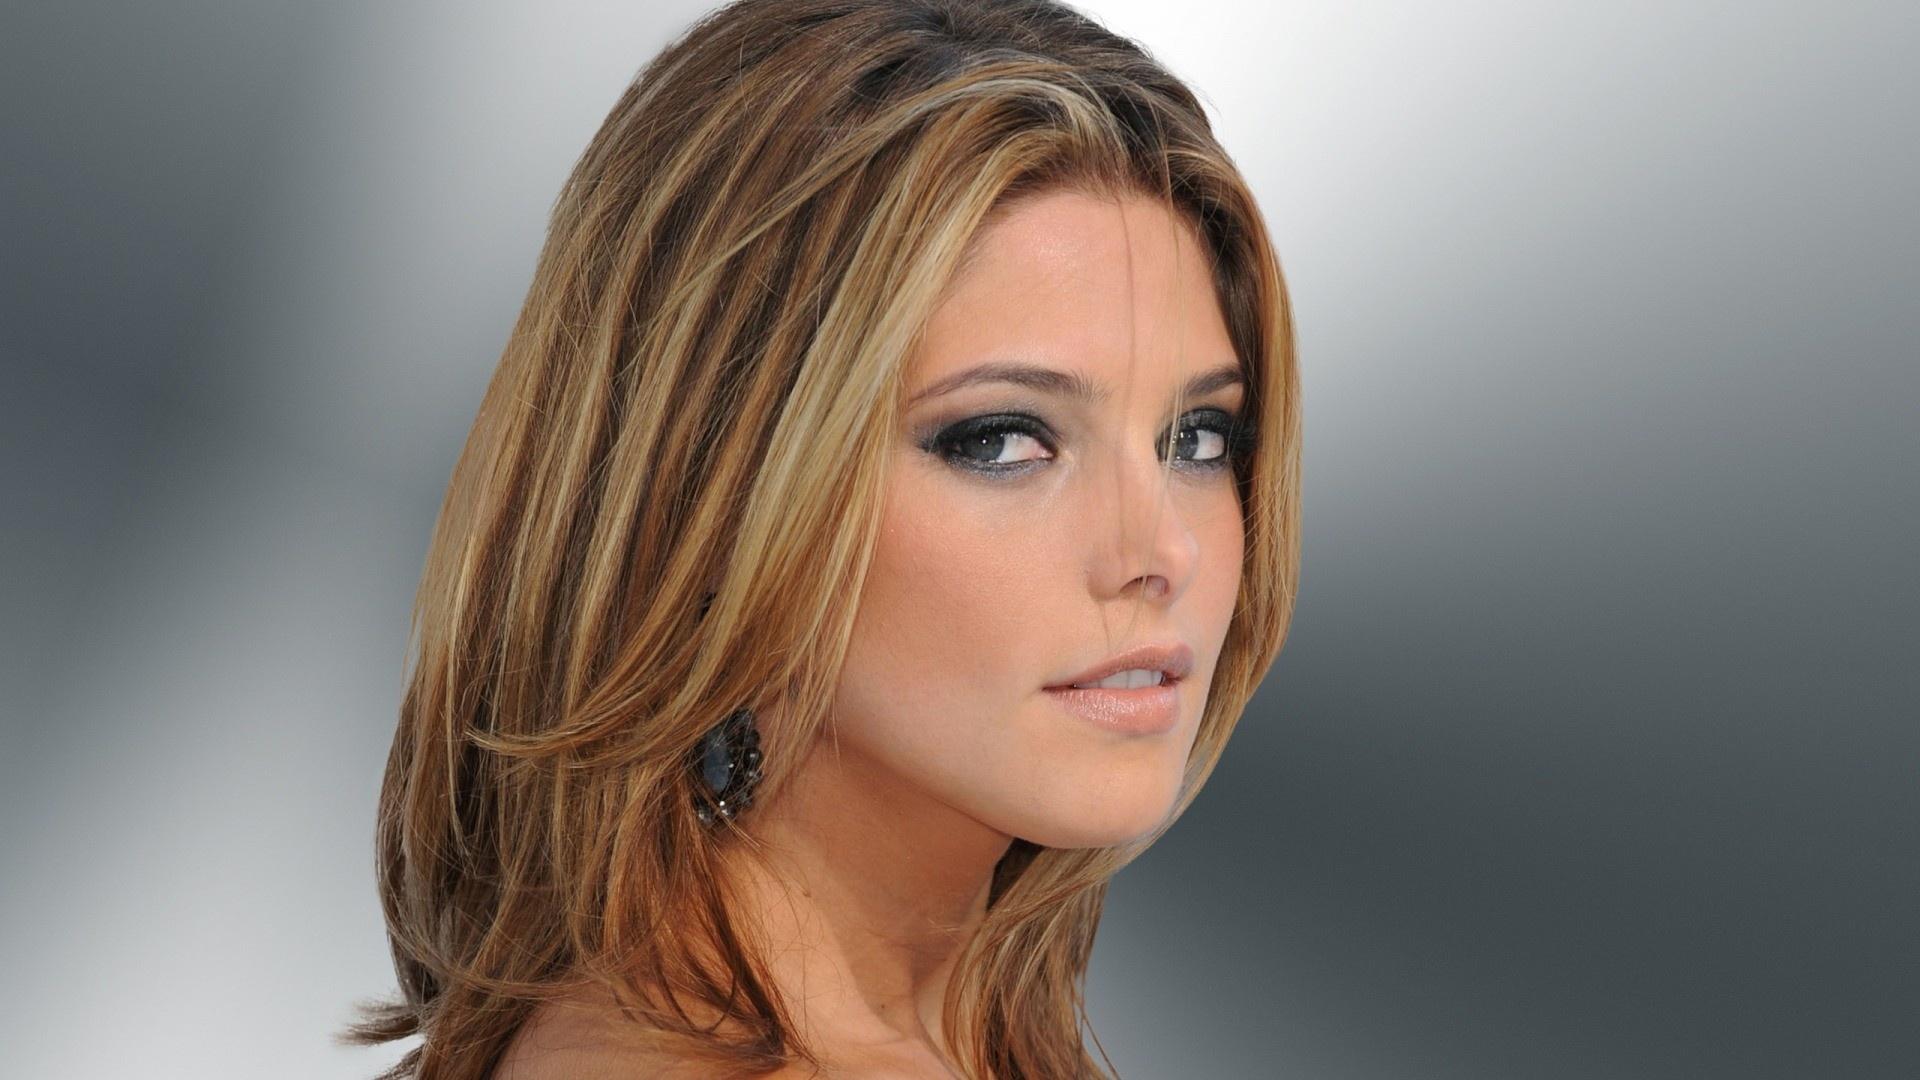 Star Celebrity Wallpapers Ashley Greene Hd Wallpapers: Full HD Desktop Wallpapers 1080p